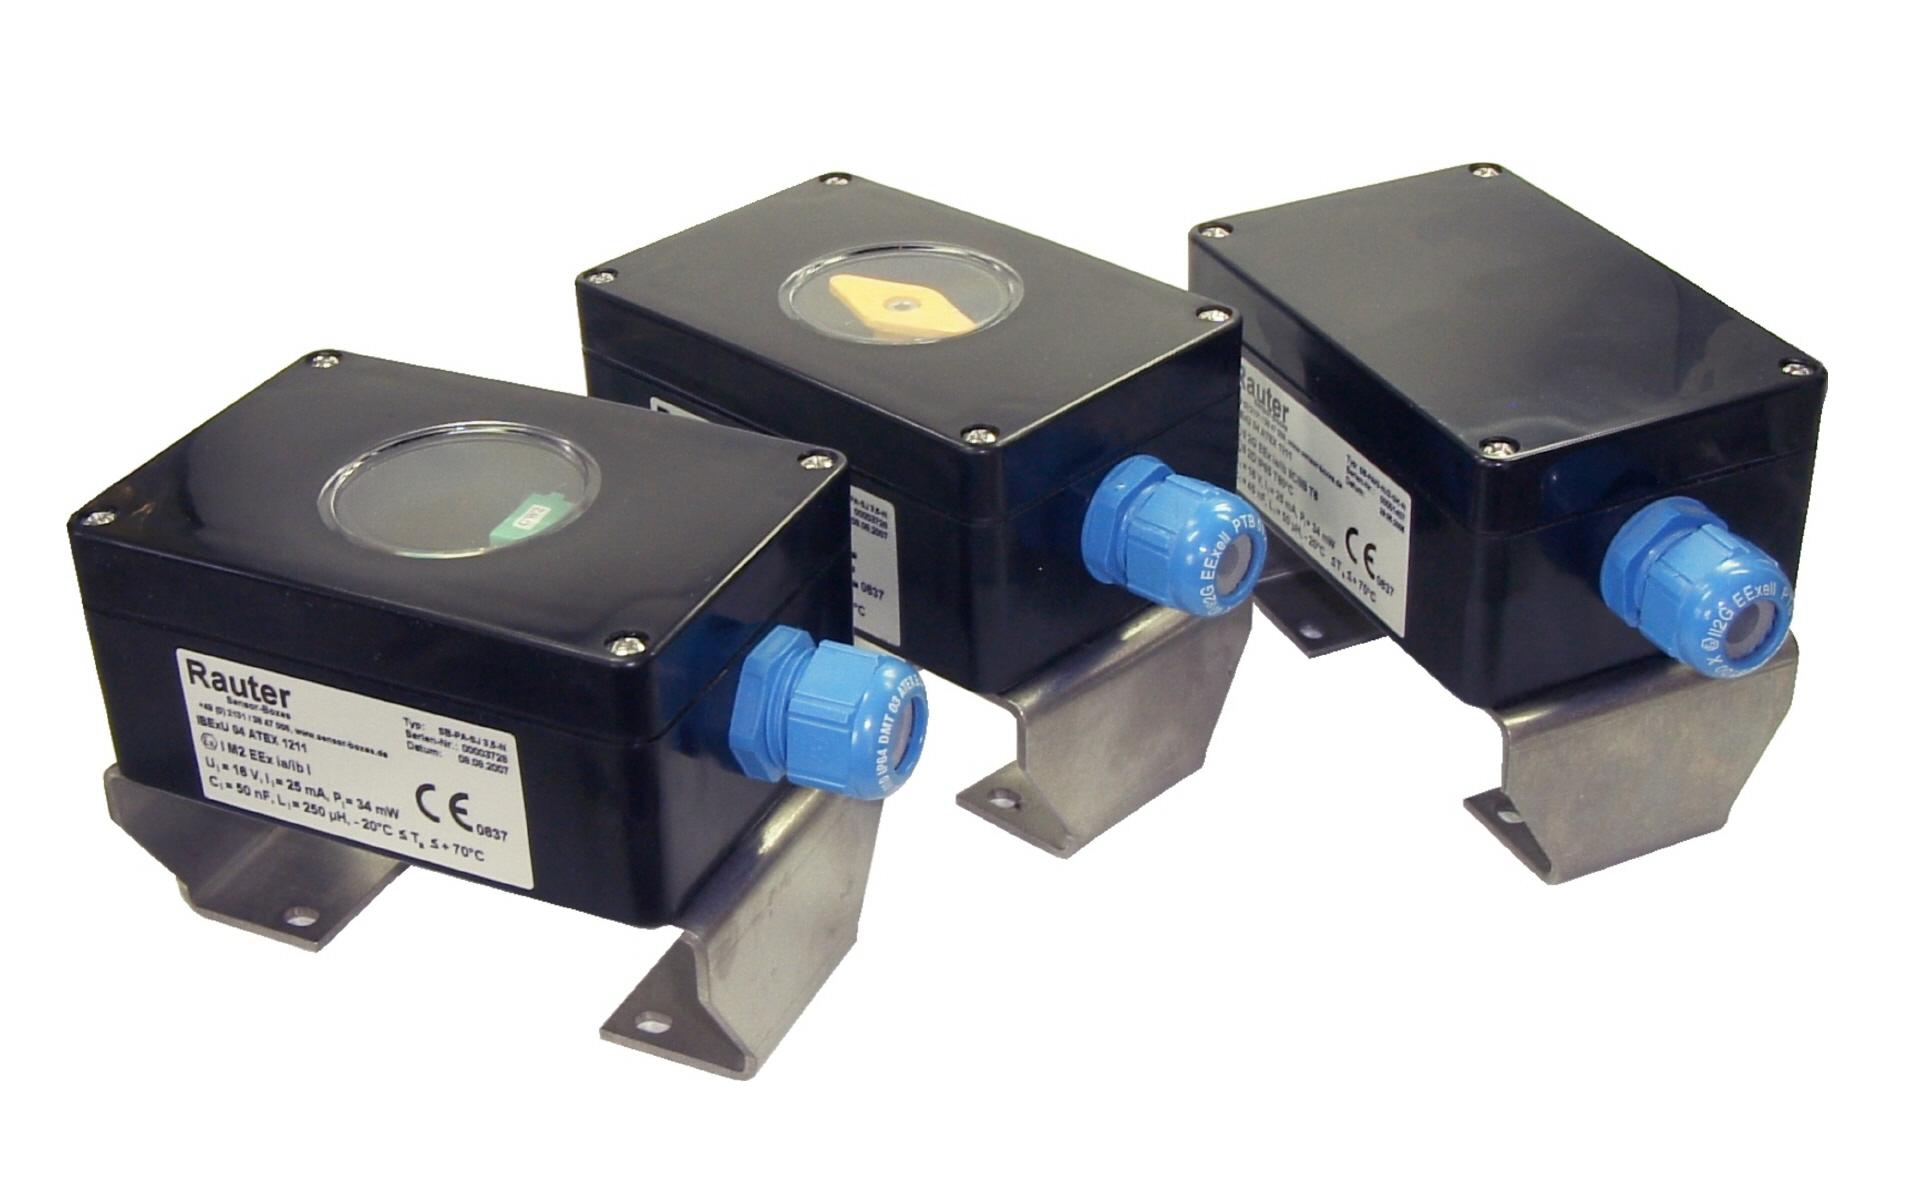 Limit Switch Boxes Valve Position Monitors For Valve